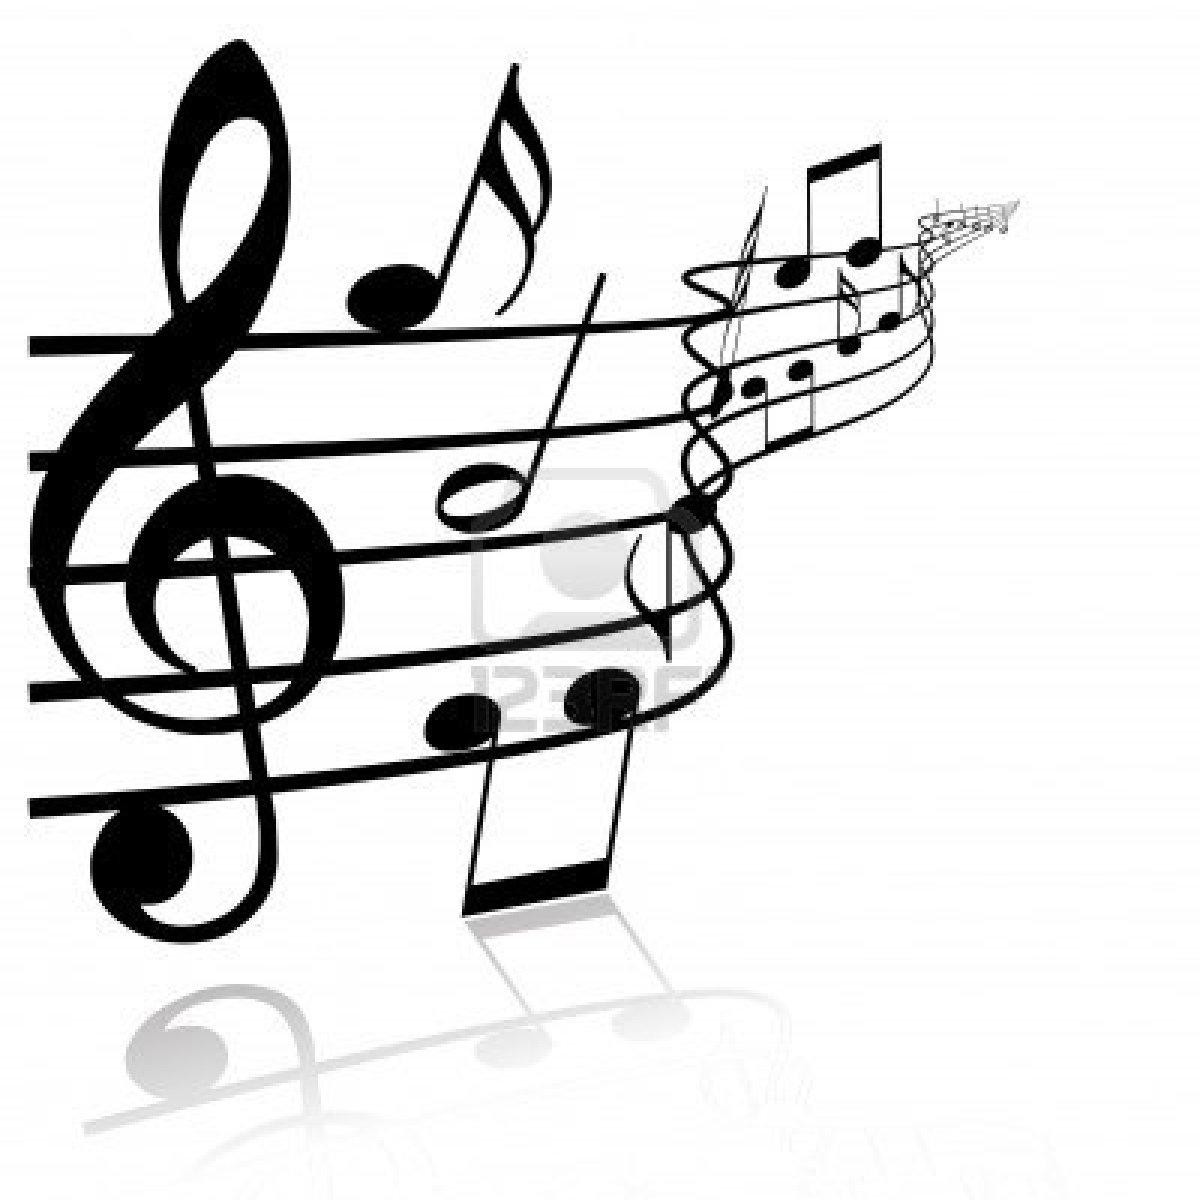 White music notes on black background